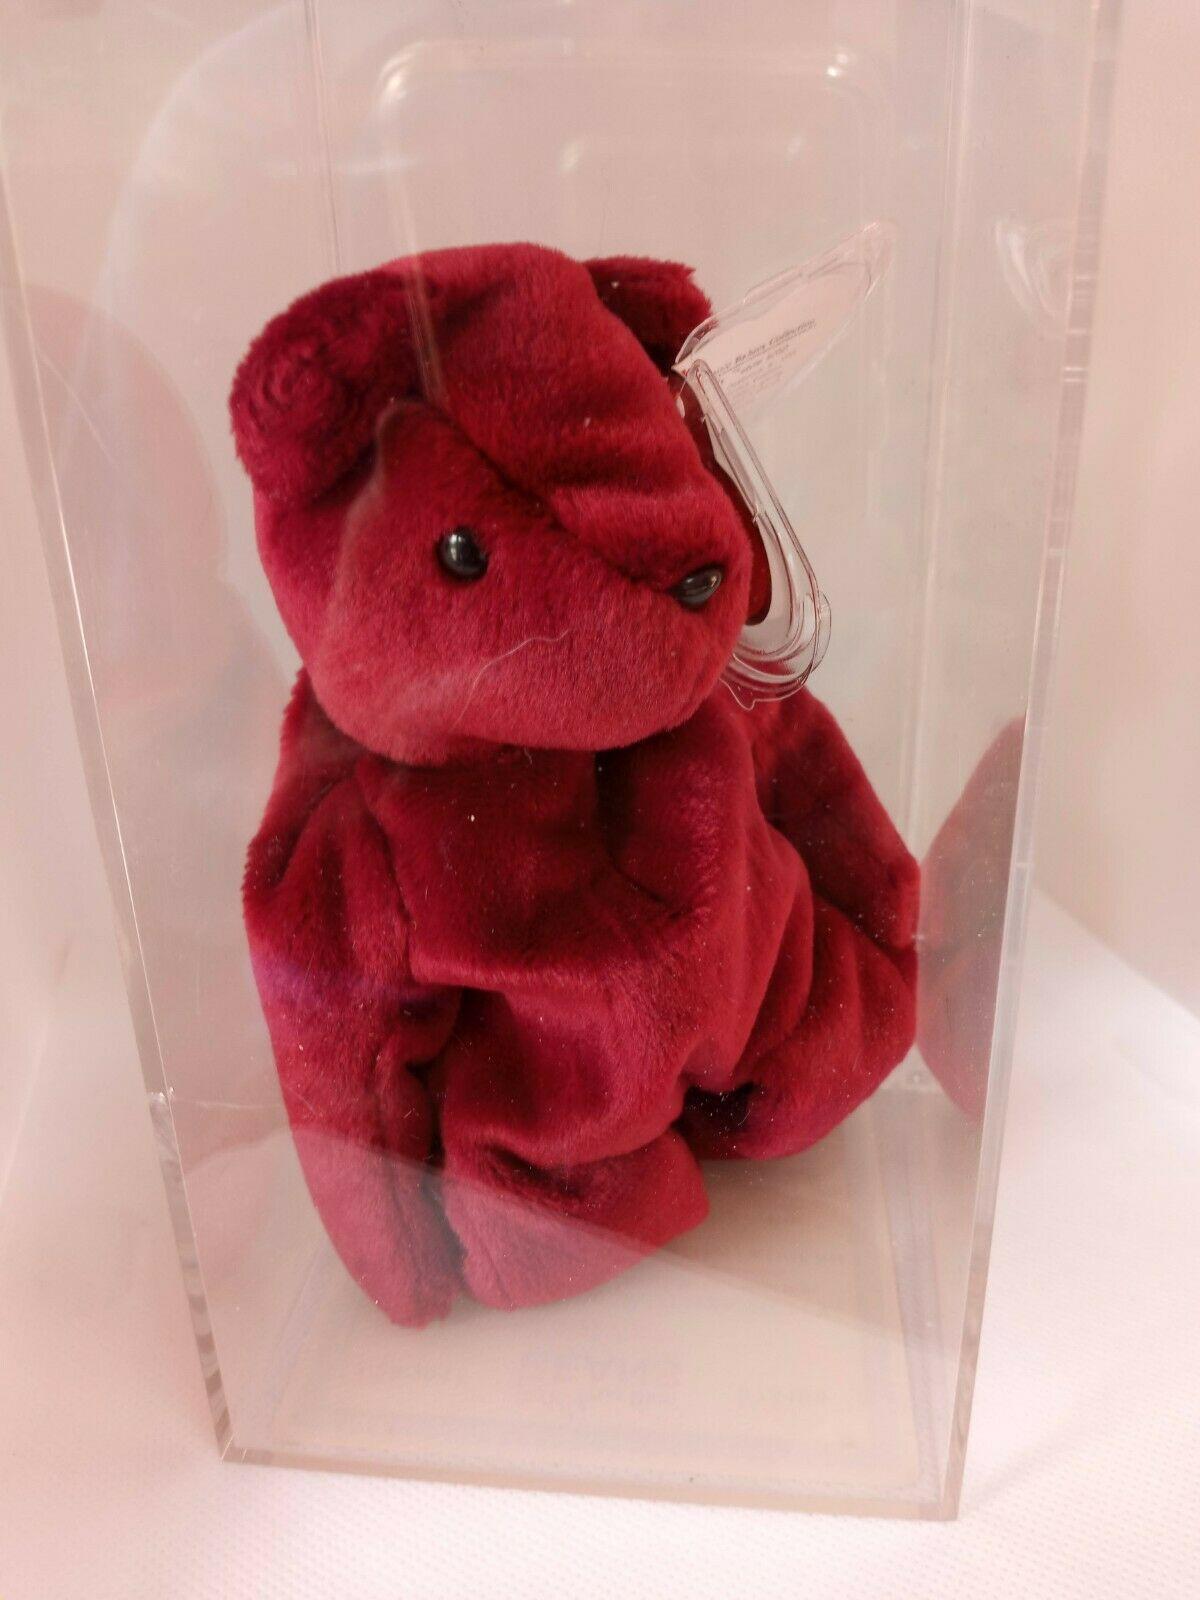 Cranberry Teddy (With Geman/Korean Tags) Beanie Baby